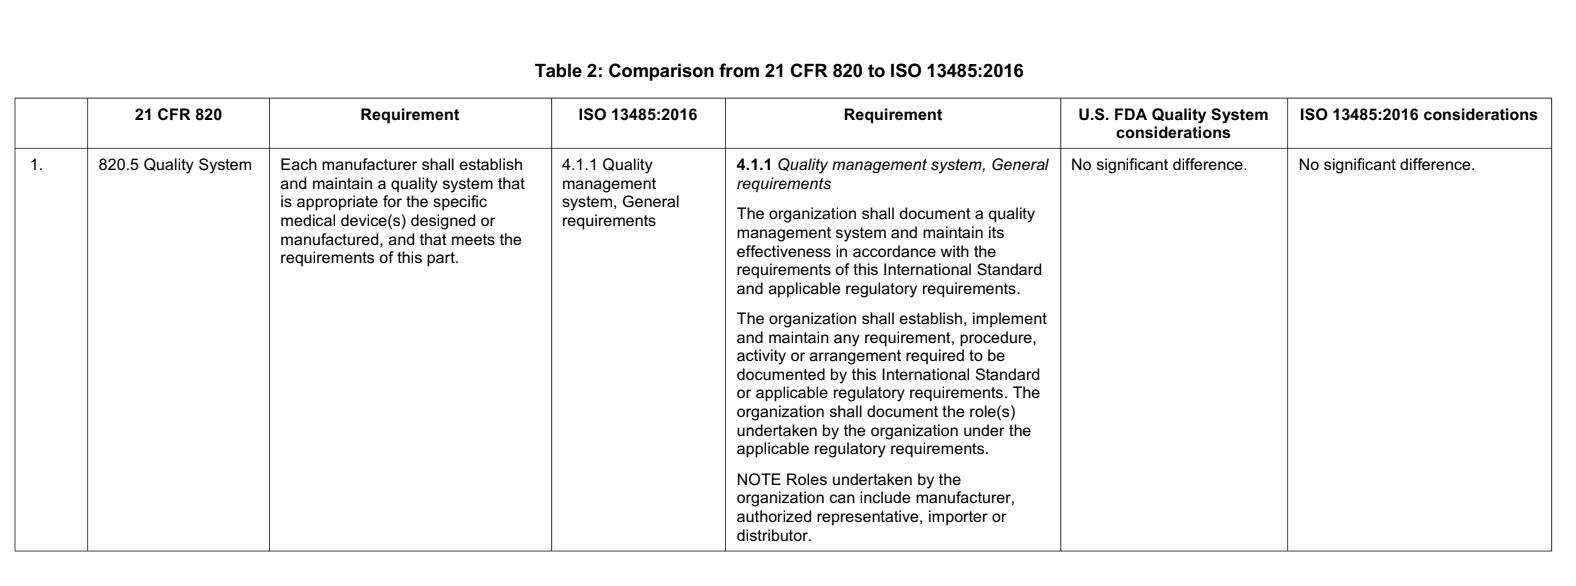 FDA QSR Transition to ISO 13485